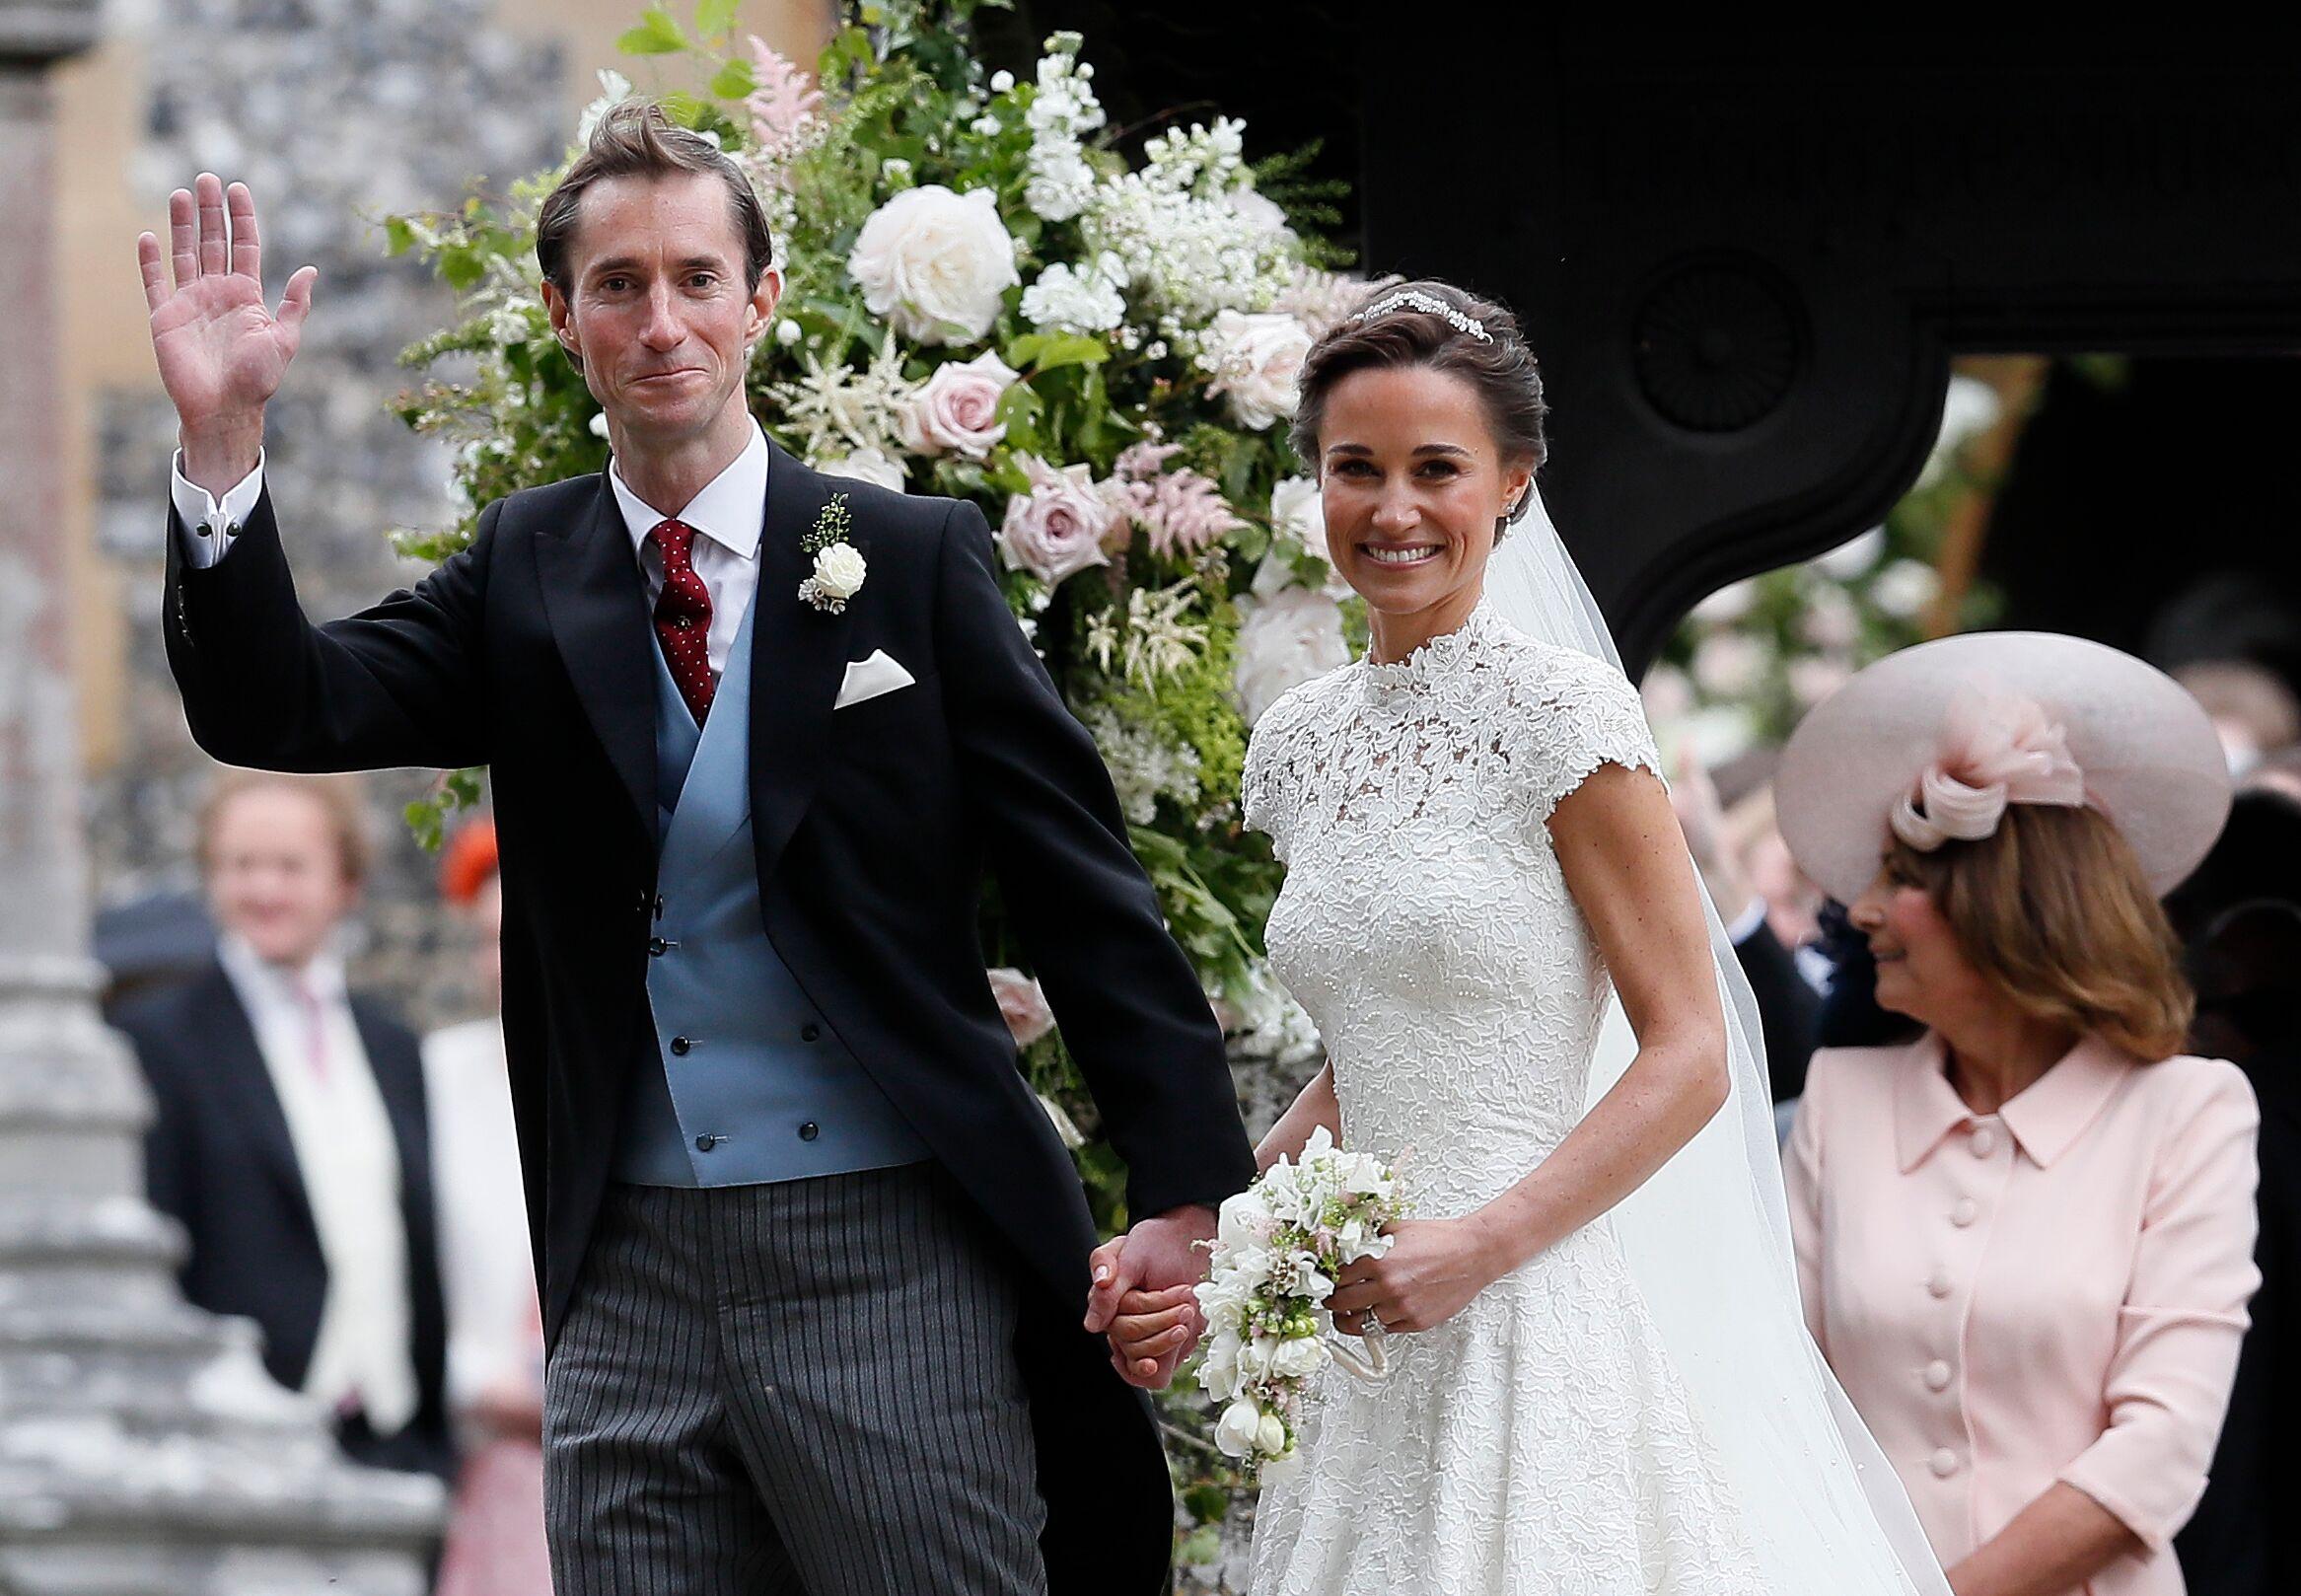 Pippa Middleton durant son mariage avec James Matthews. l Source : Getty Images